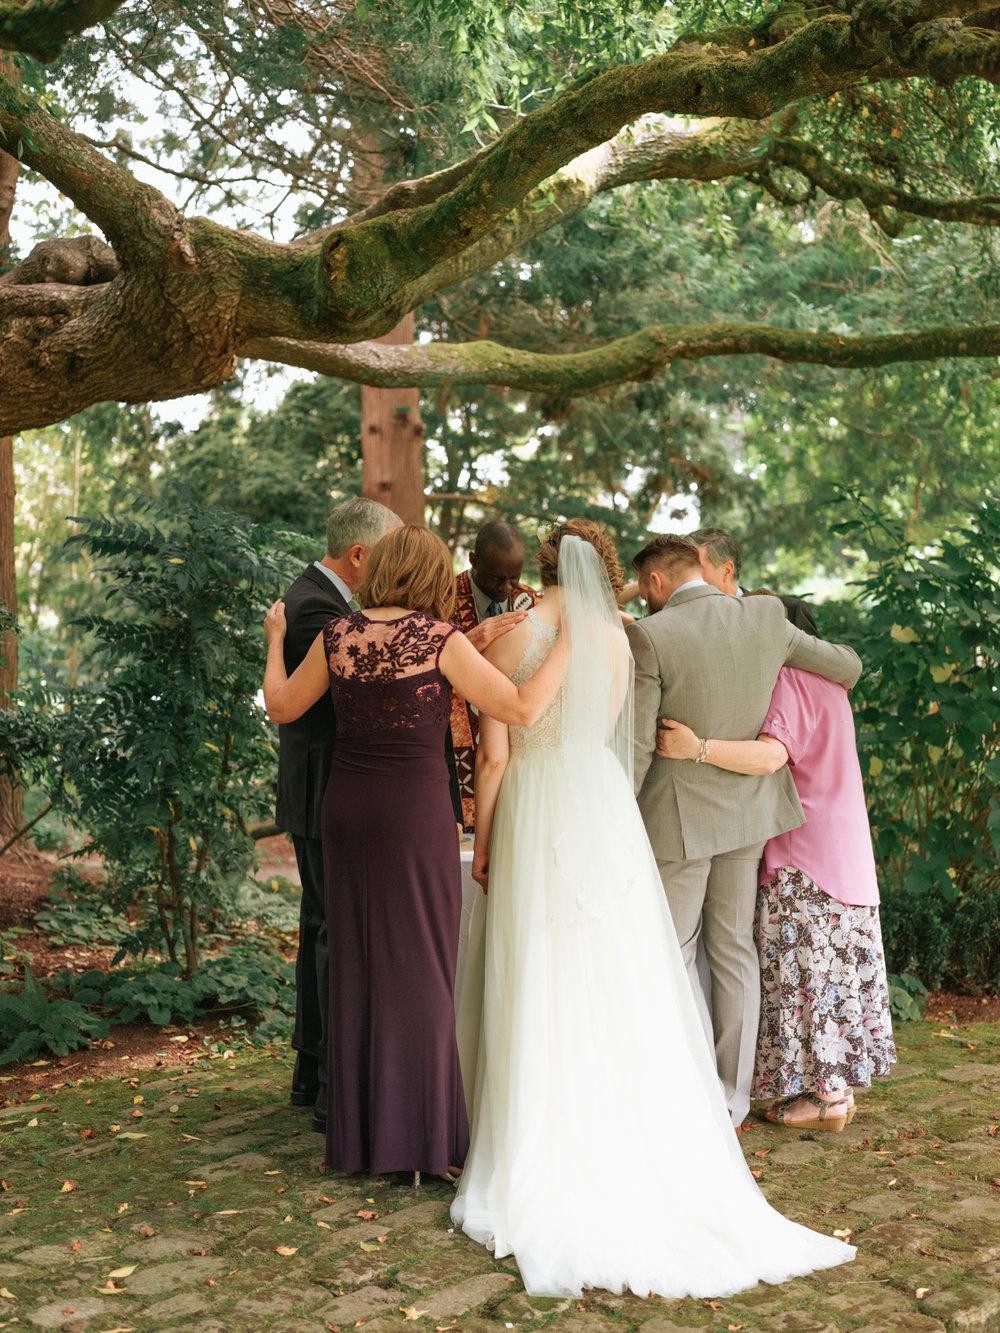 Stolen Glimpses Seattle Wedding Photographer Hidden Meadows Wedding 66.jpg